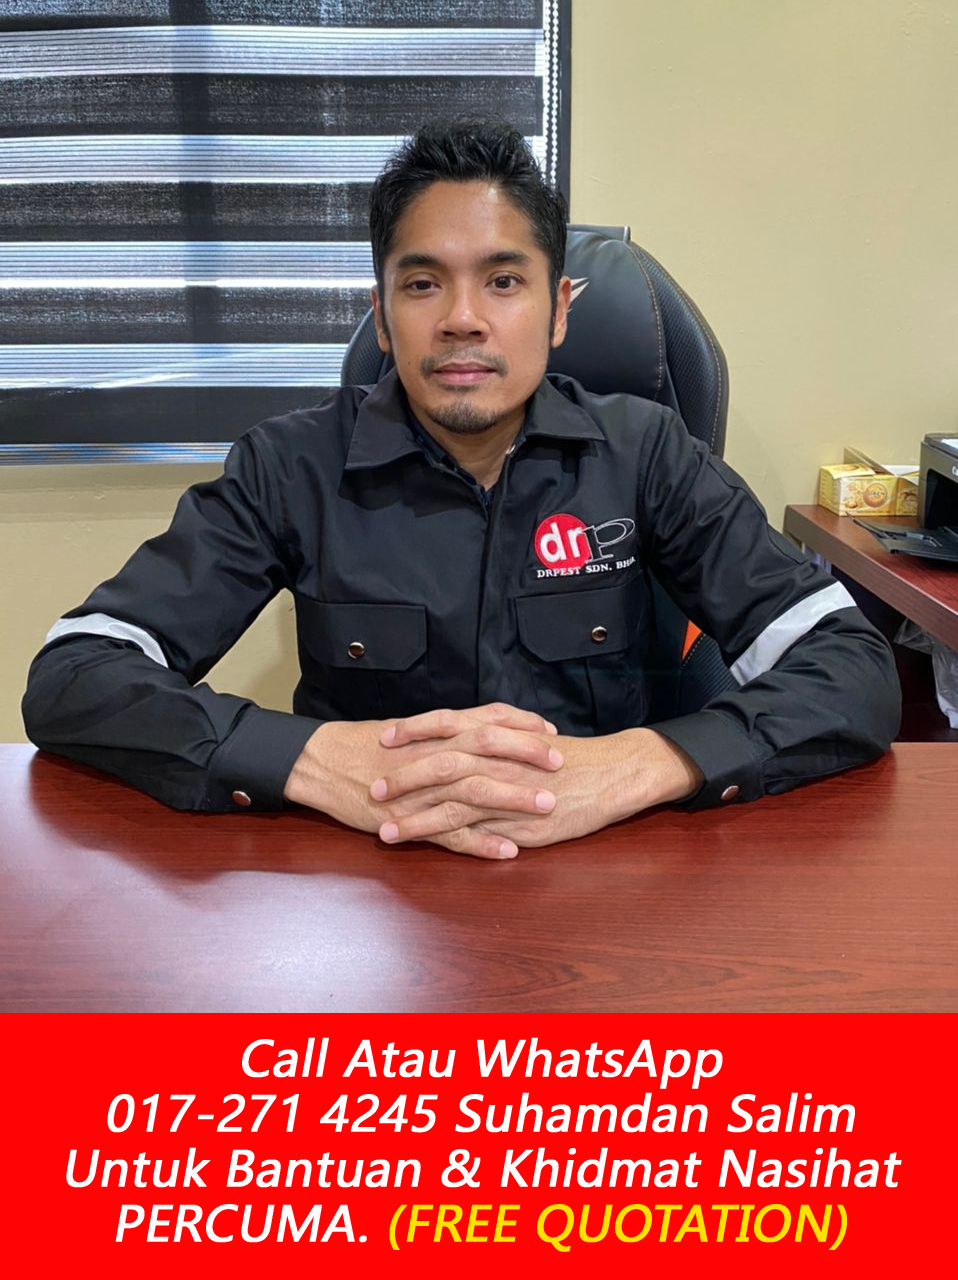 drpest sdn bhd drp maintenance and services syarikat kawalan serangga bumiputra yang berlesen the best company pest control near me area Kampung Datuk Keramat kl near me